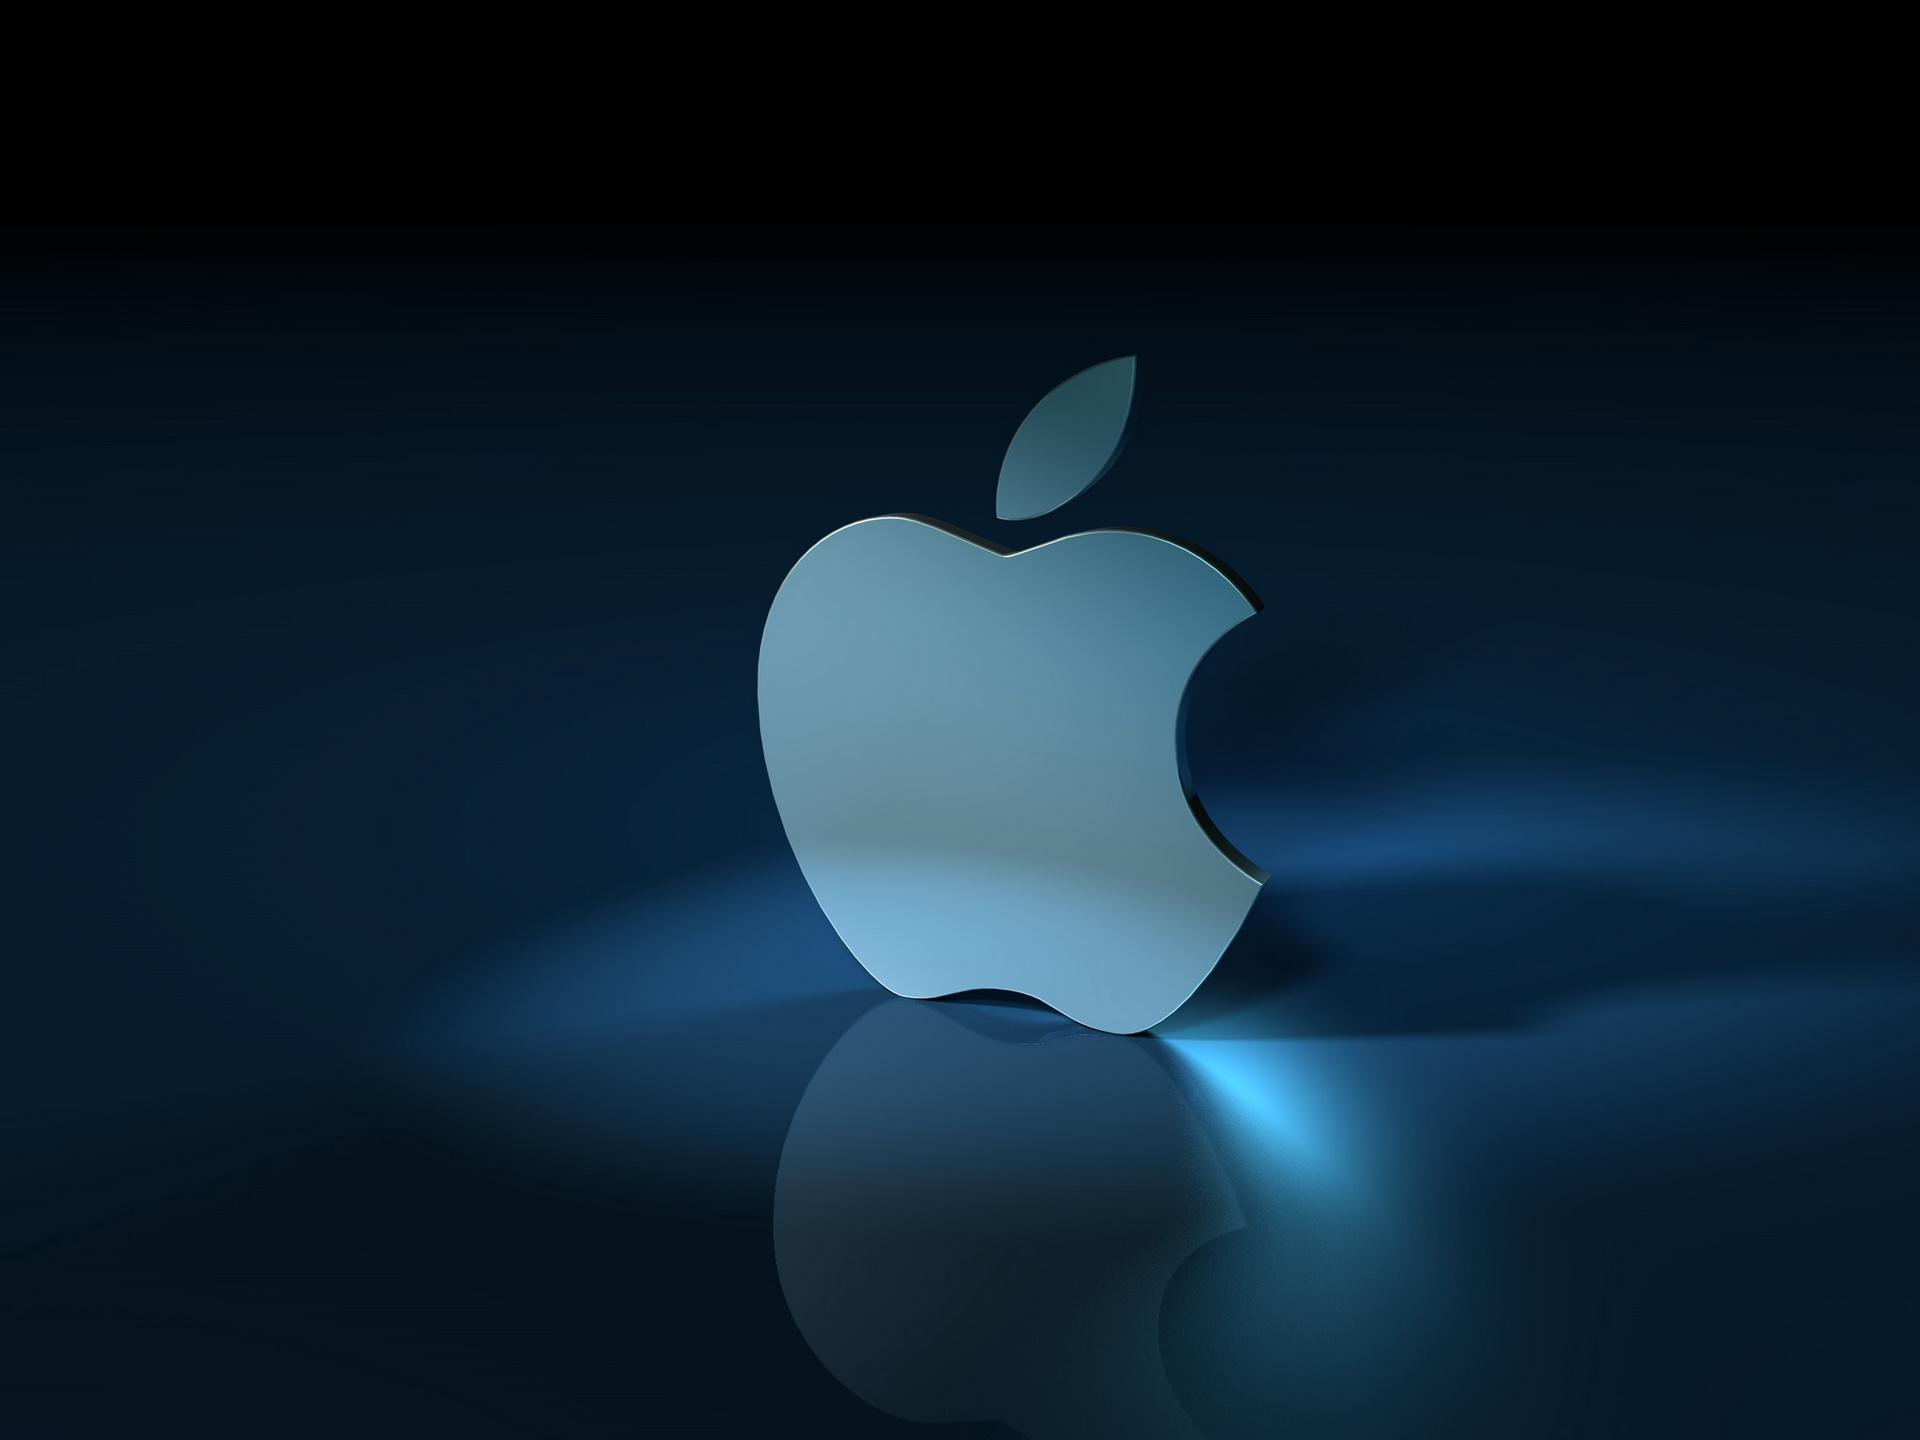 4K Ultra HD Creative Apple 3D